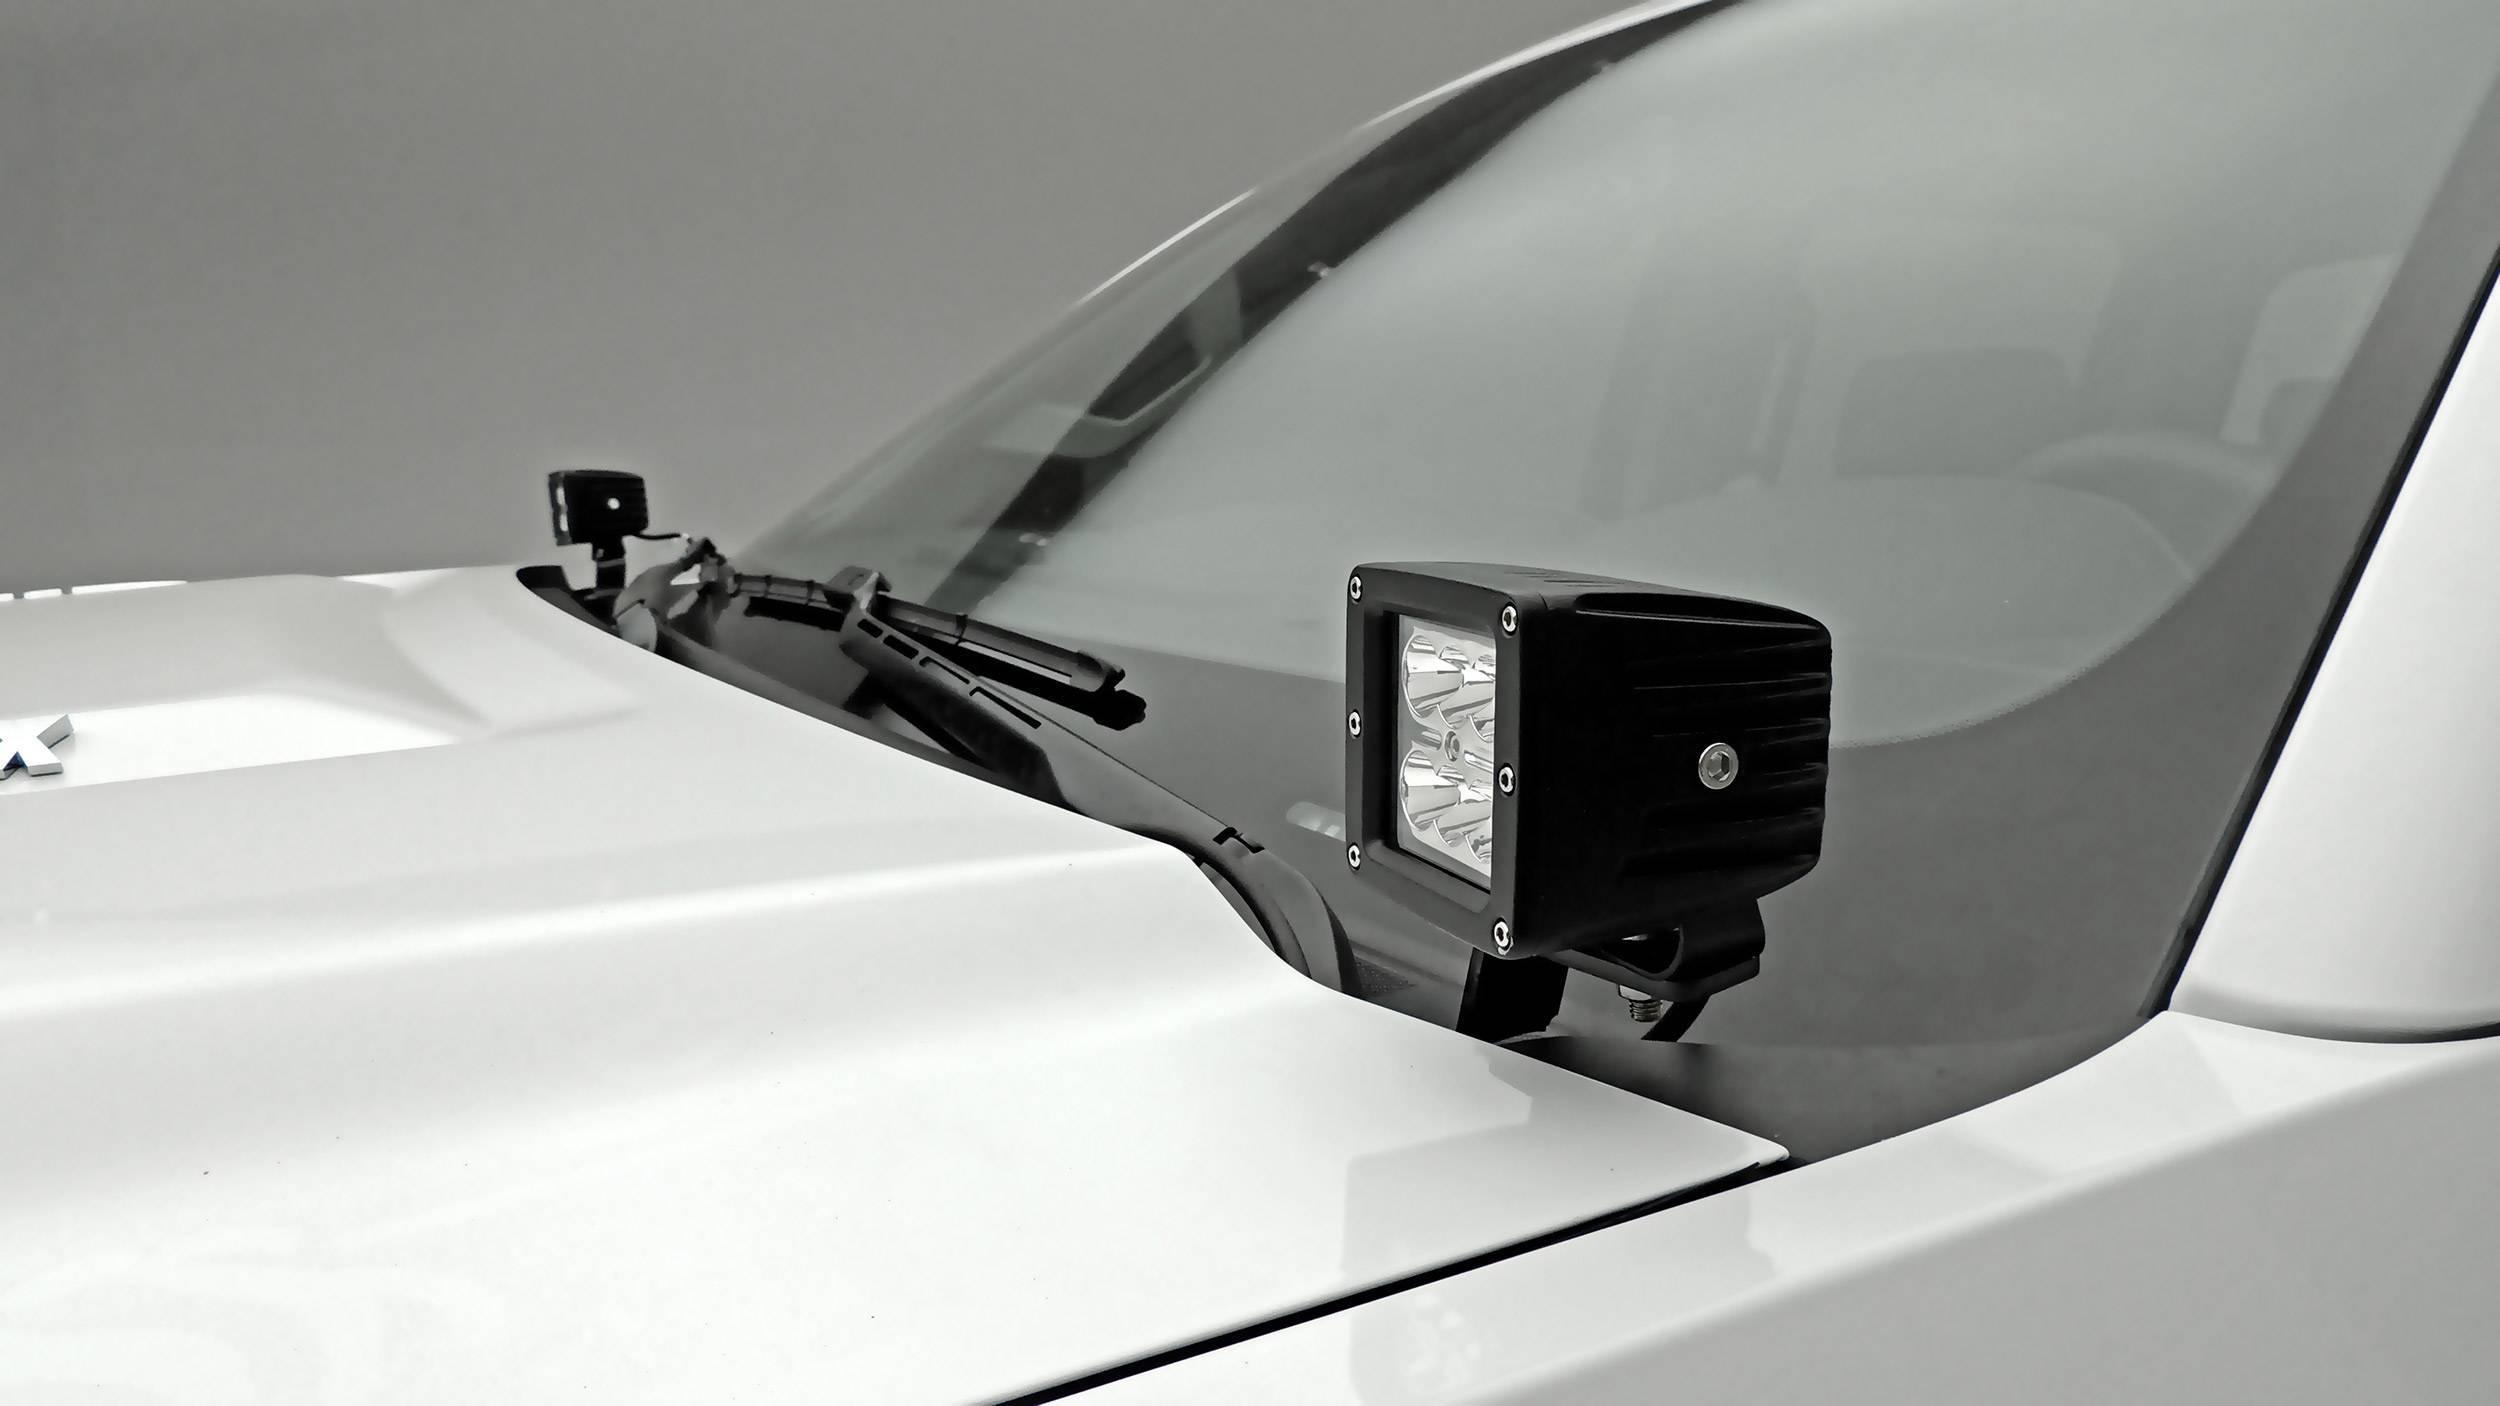 ZROADZ OFF ROAD PRODUCTS - 2015-2019 Silverado, Sierra HD Hood Hinge LED Kit with (2) 3 Inch LED Pod Lights - PN #Z361221-KIT2